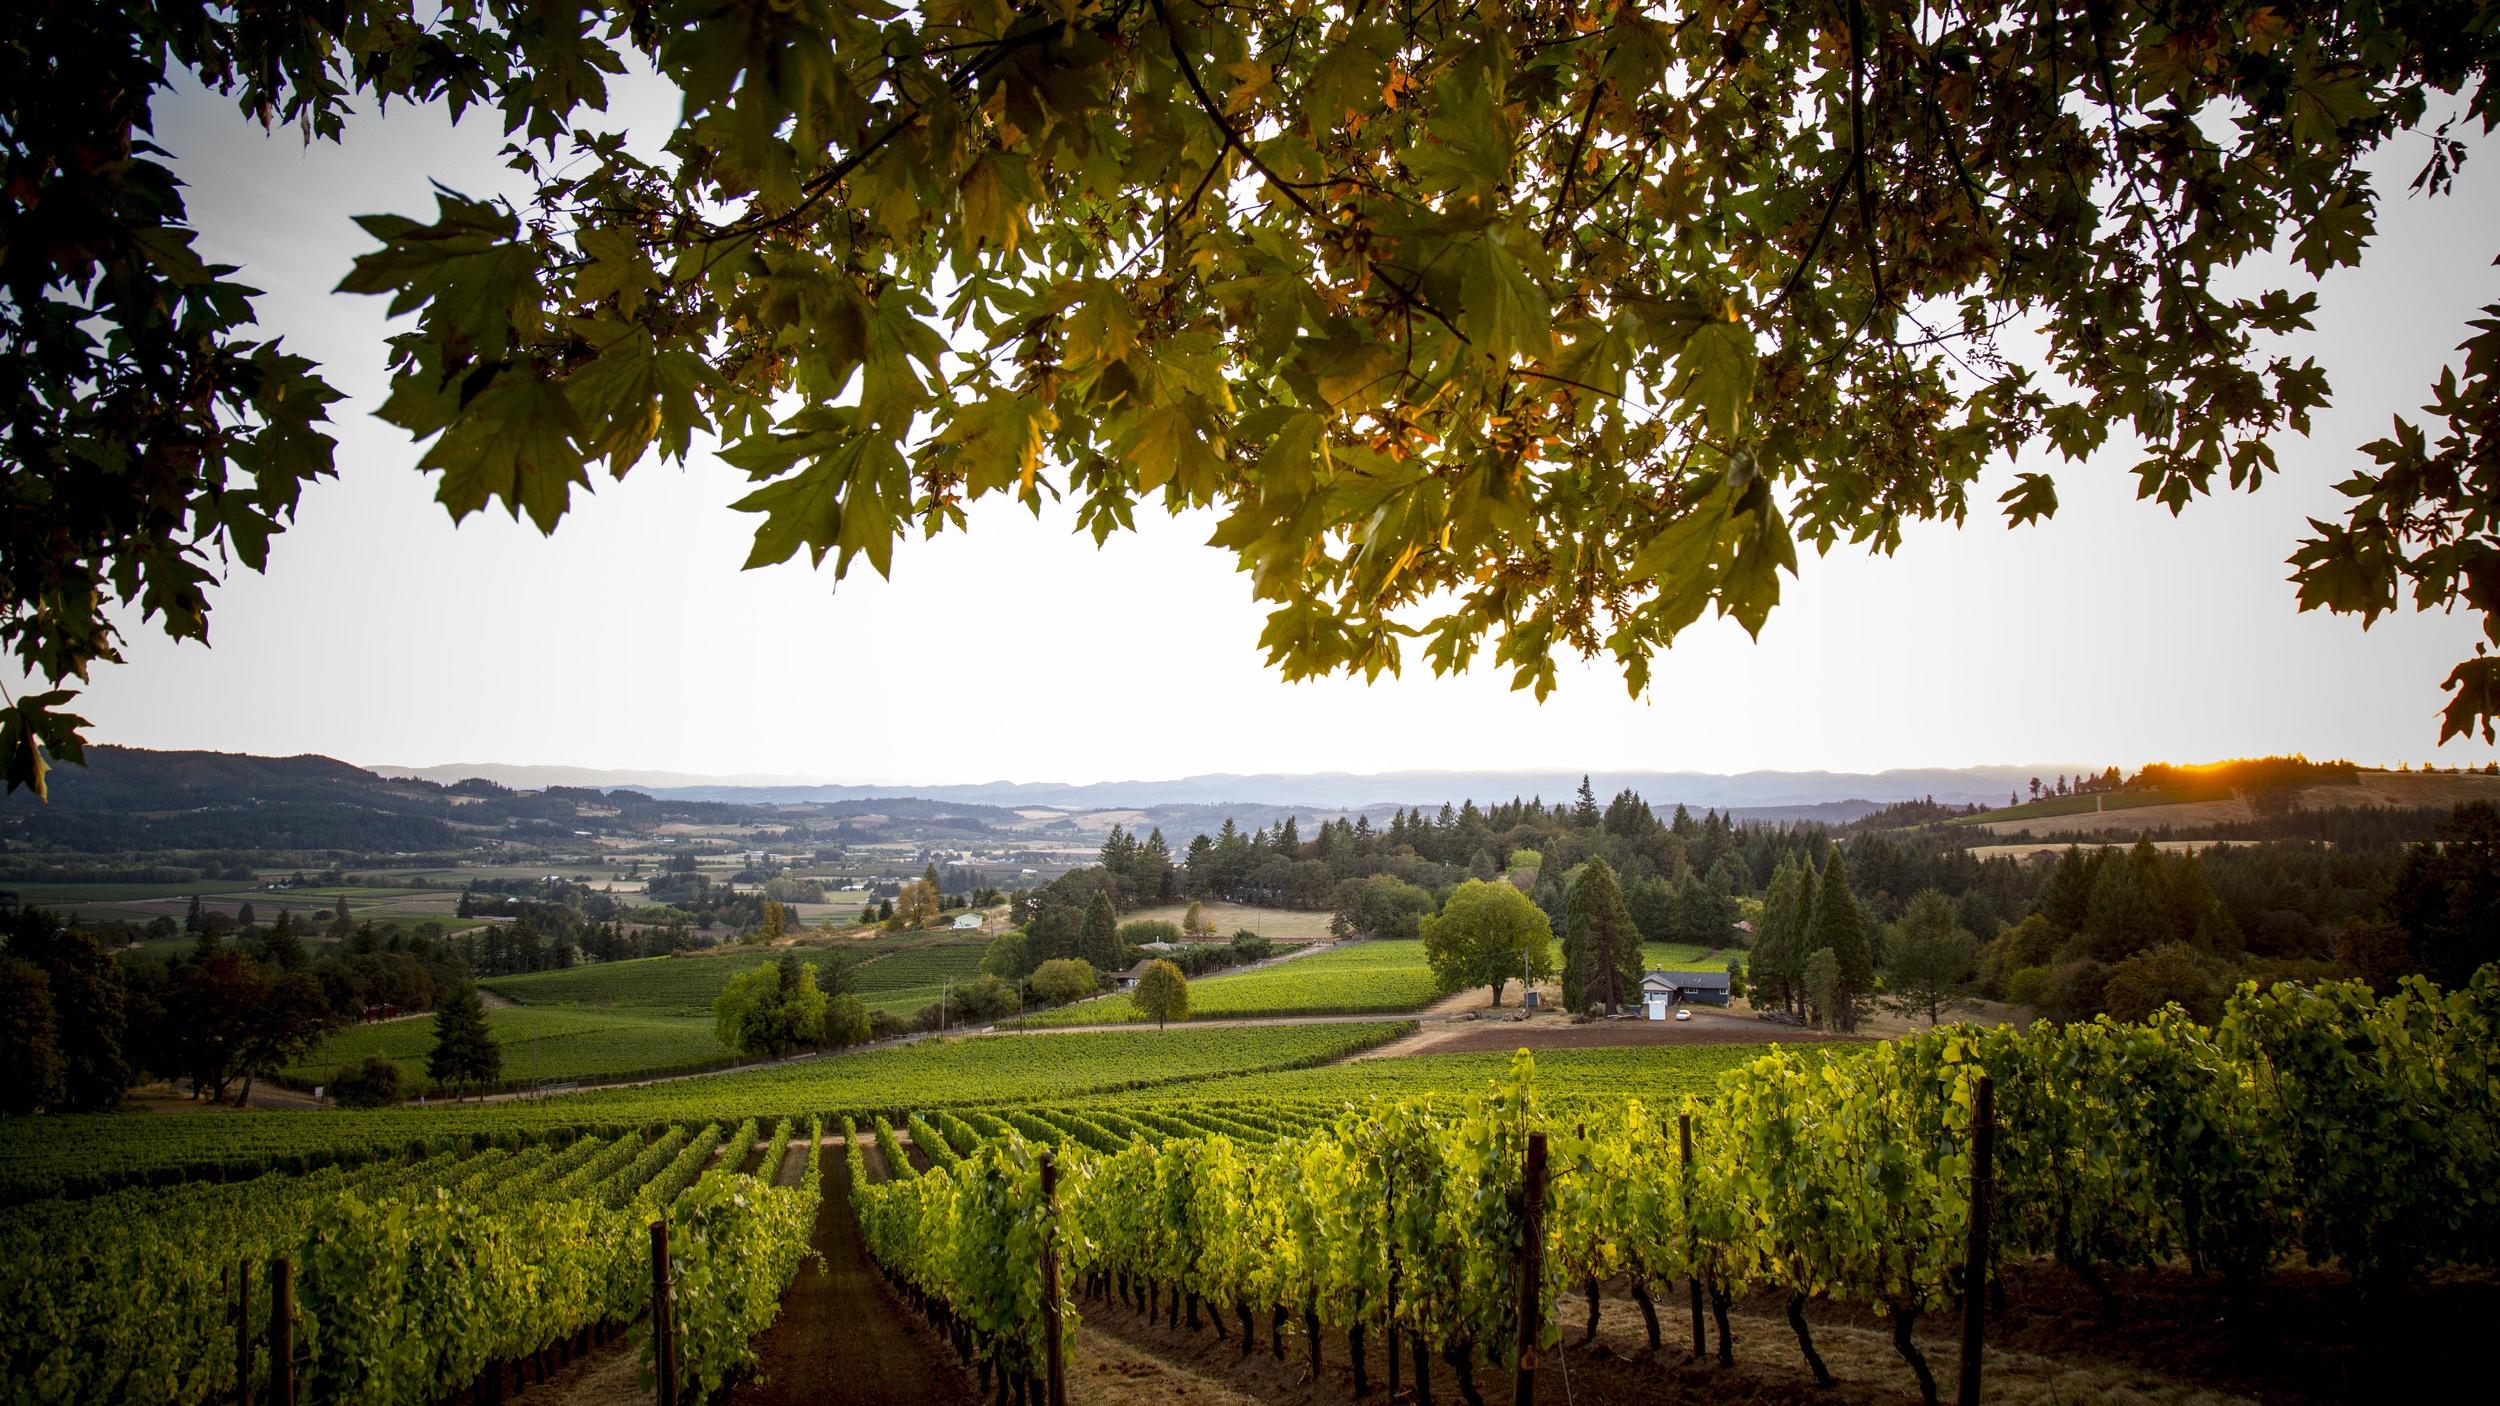 Scenic landscape view of Adelsheim Vineyard